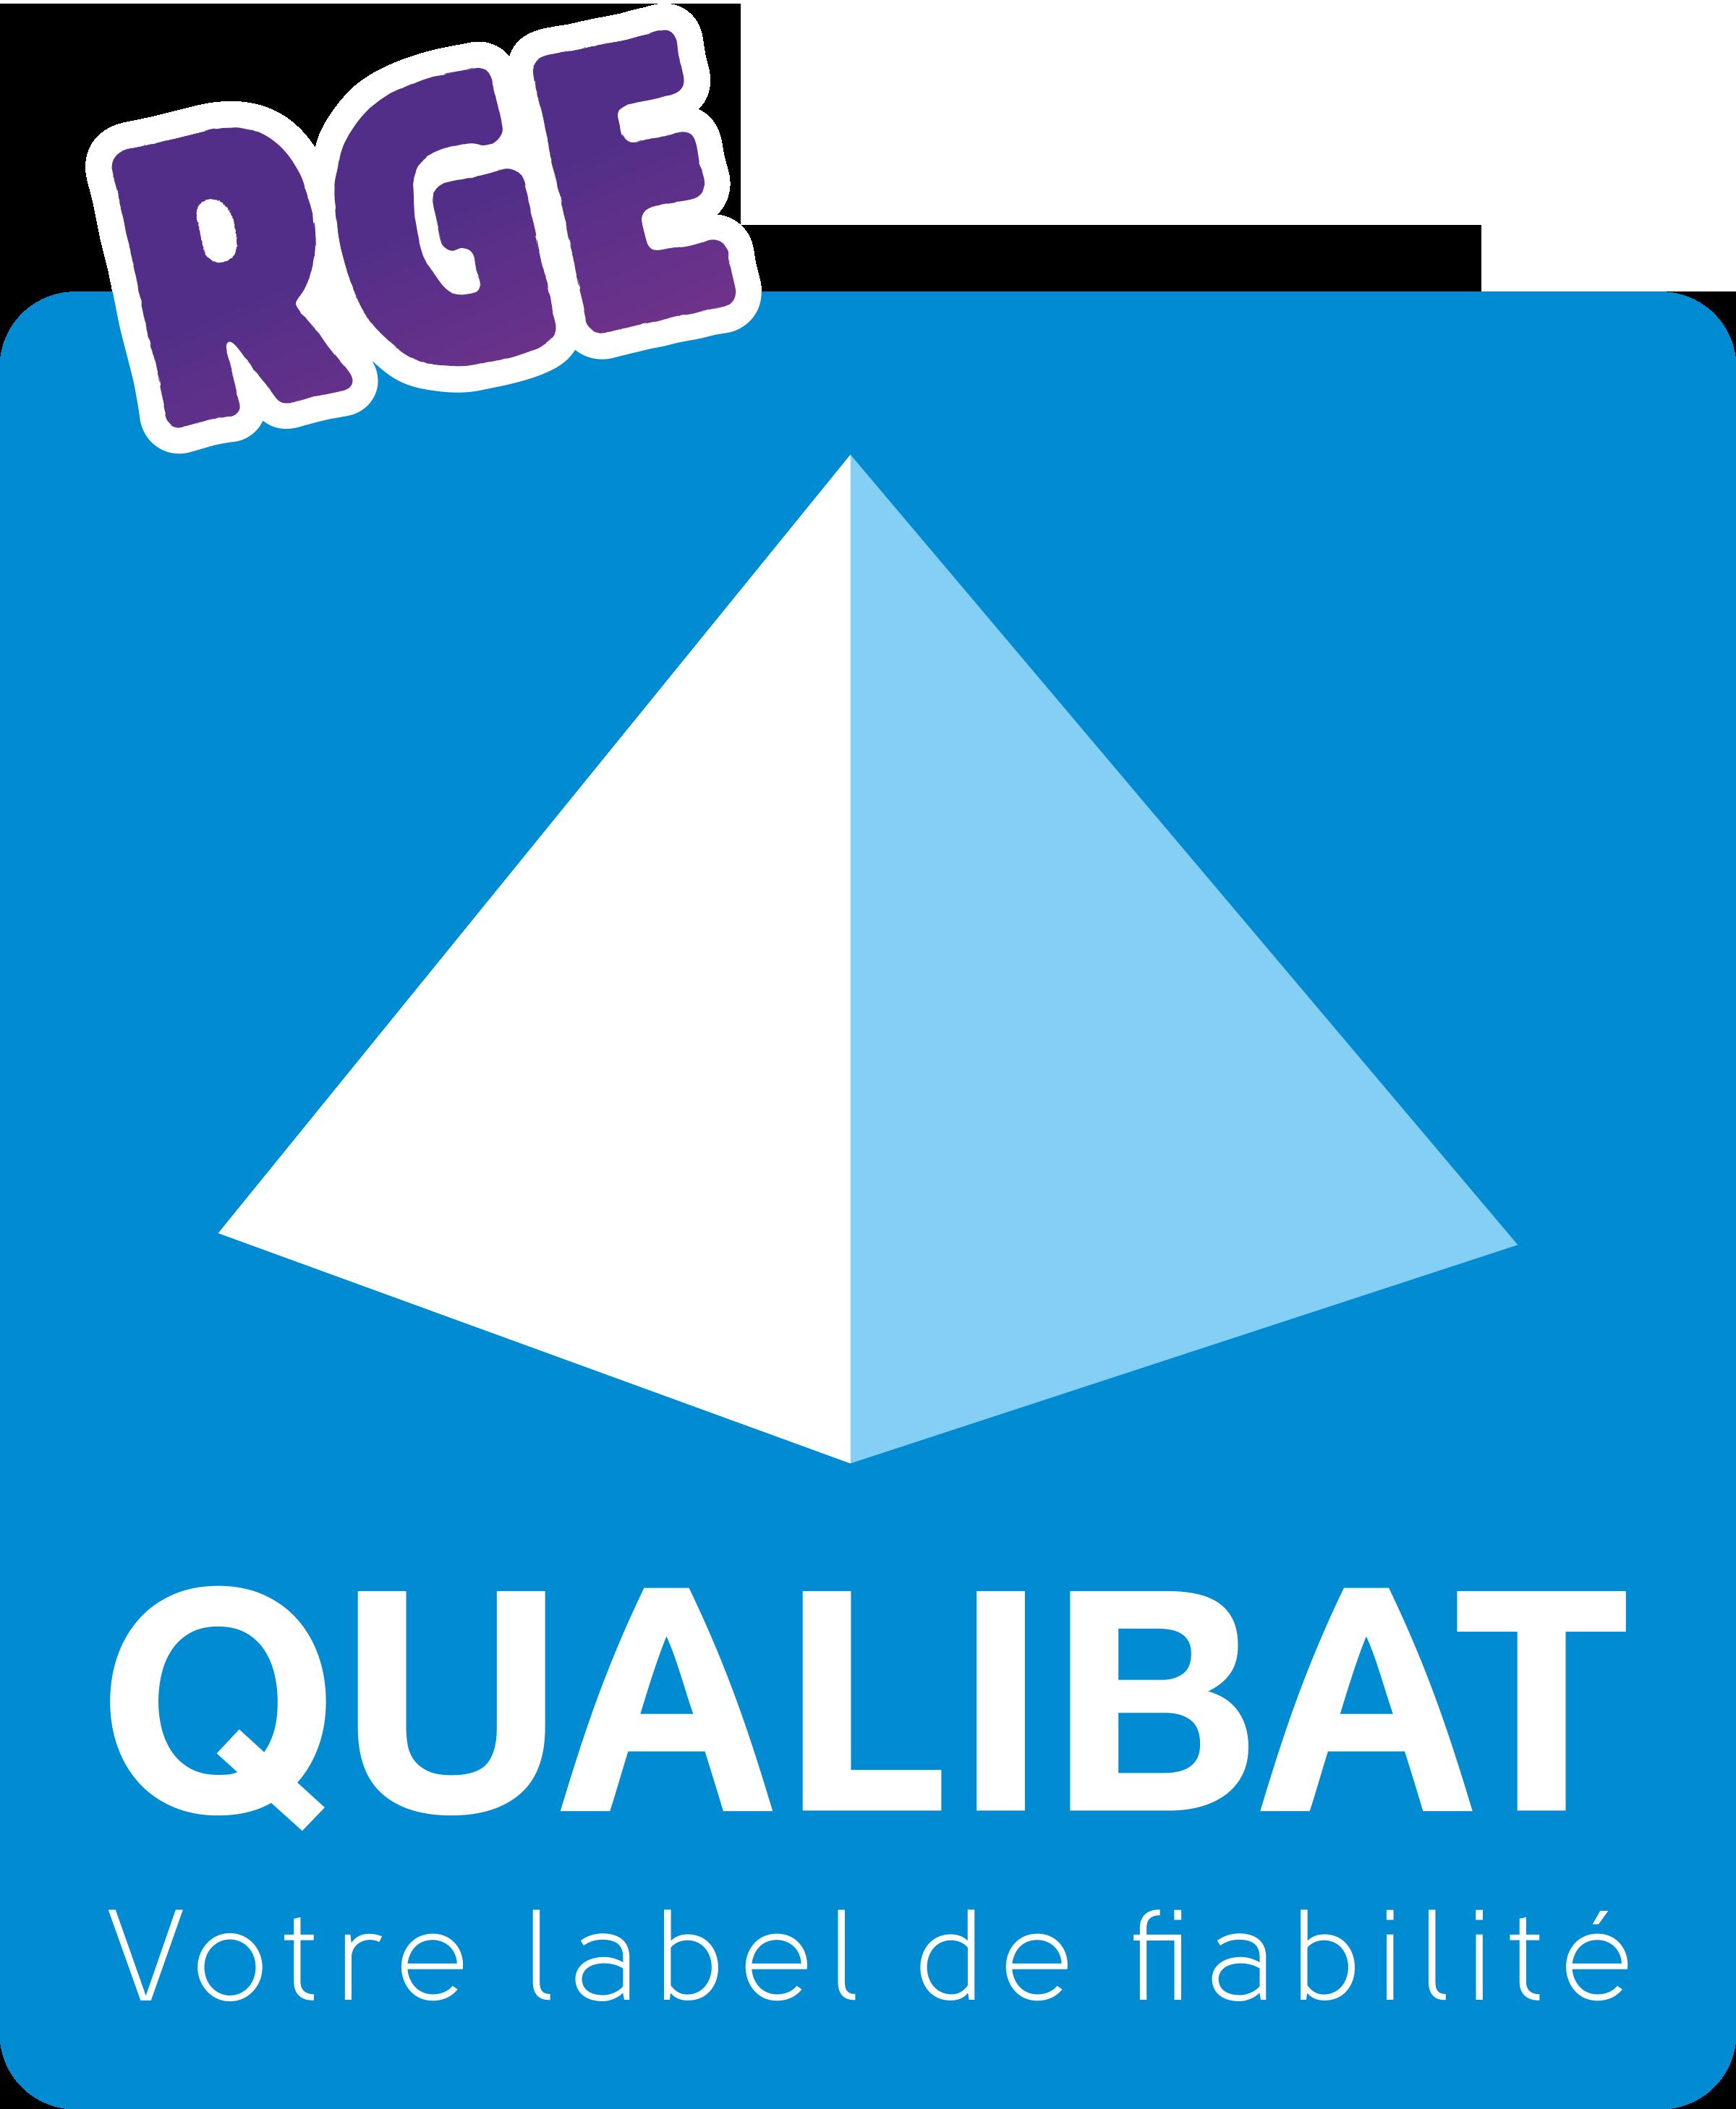 logo qualibat RGE 2015 300dpi RVB - Accueil